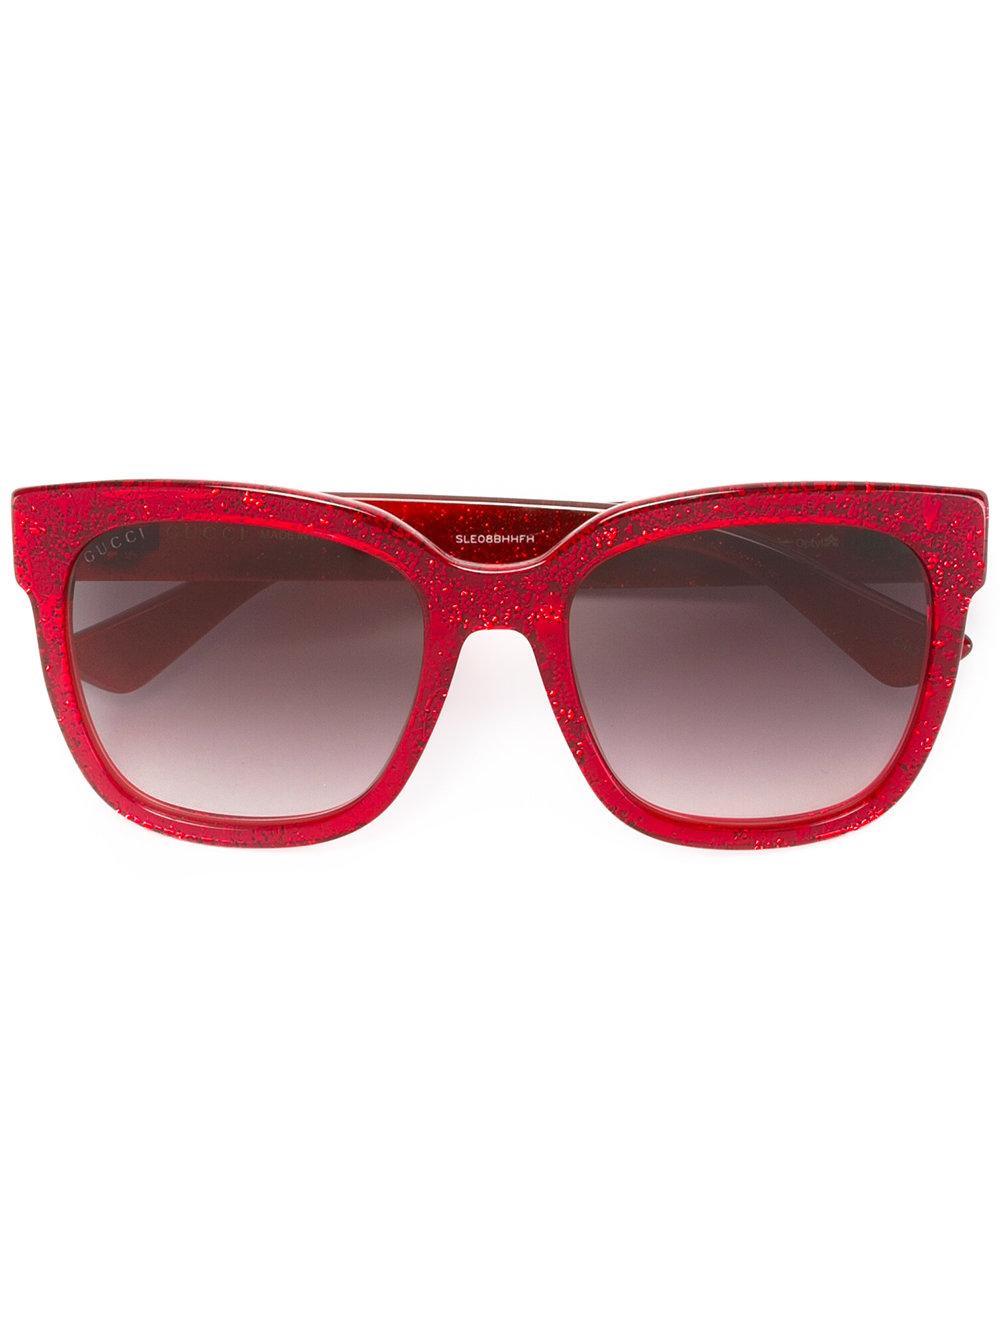 Gucci Square Frame Glitter Sunglasses in Red Lyst